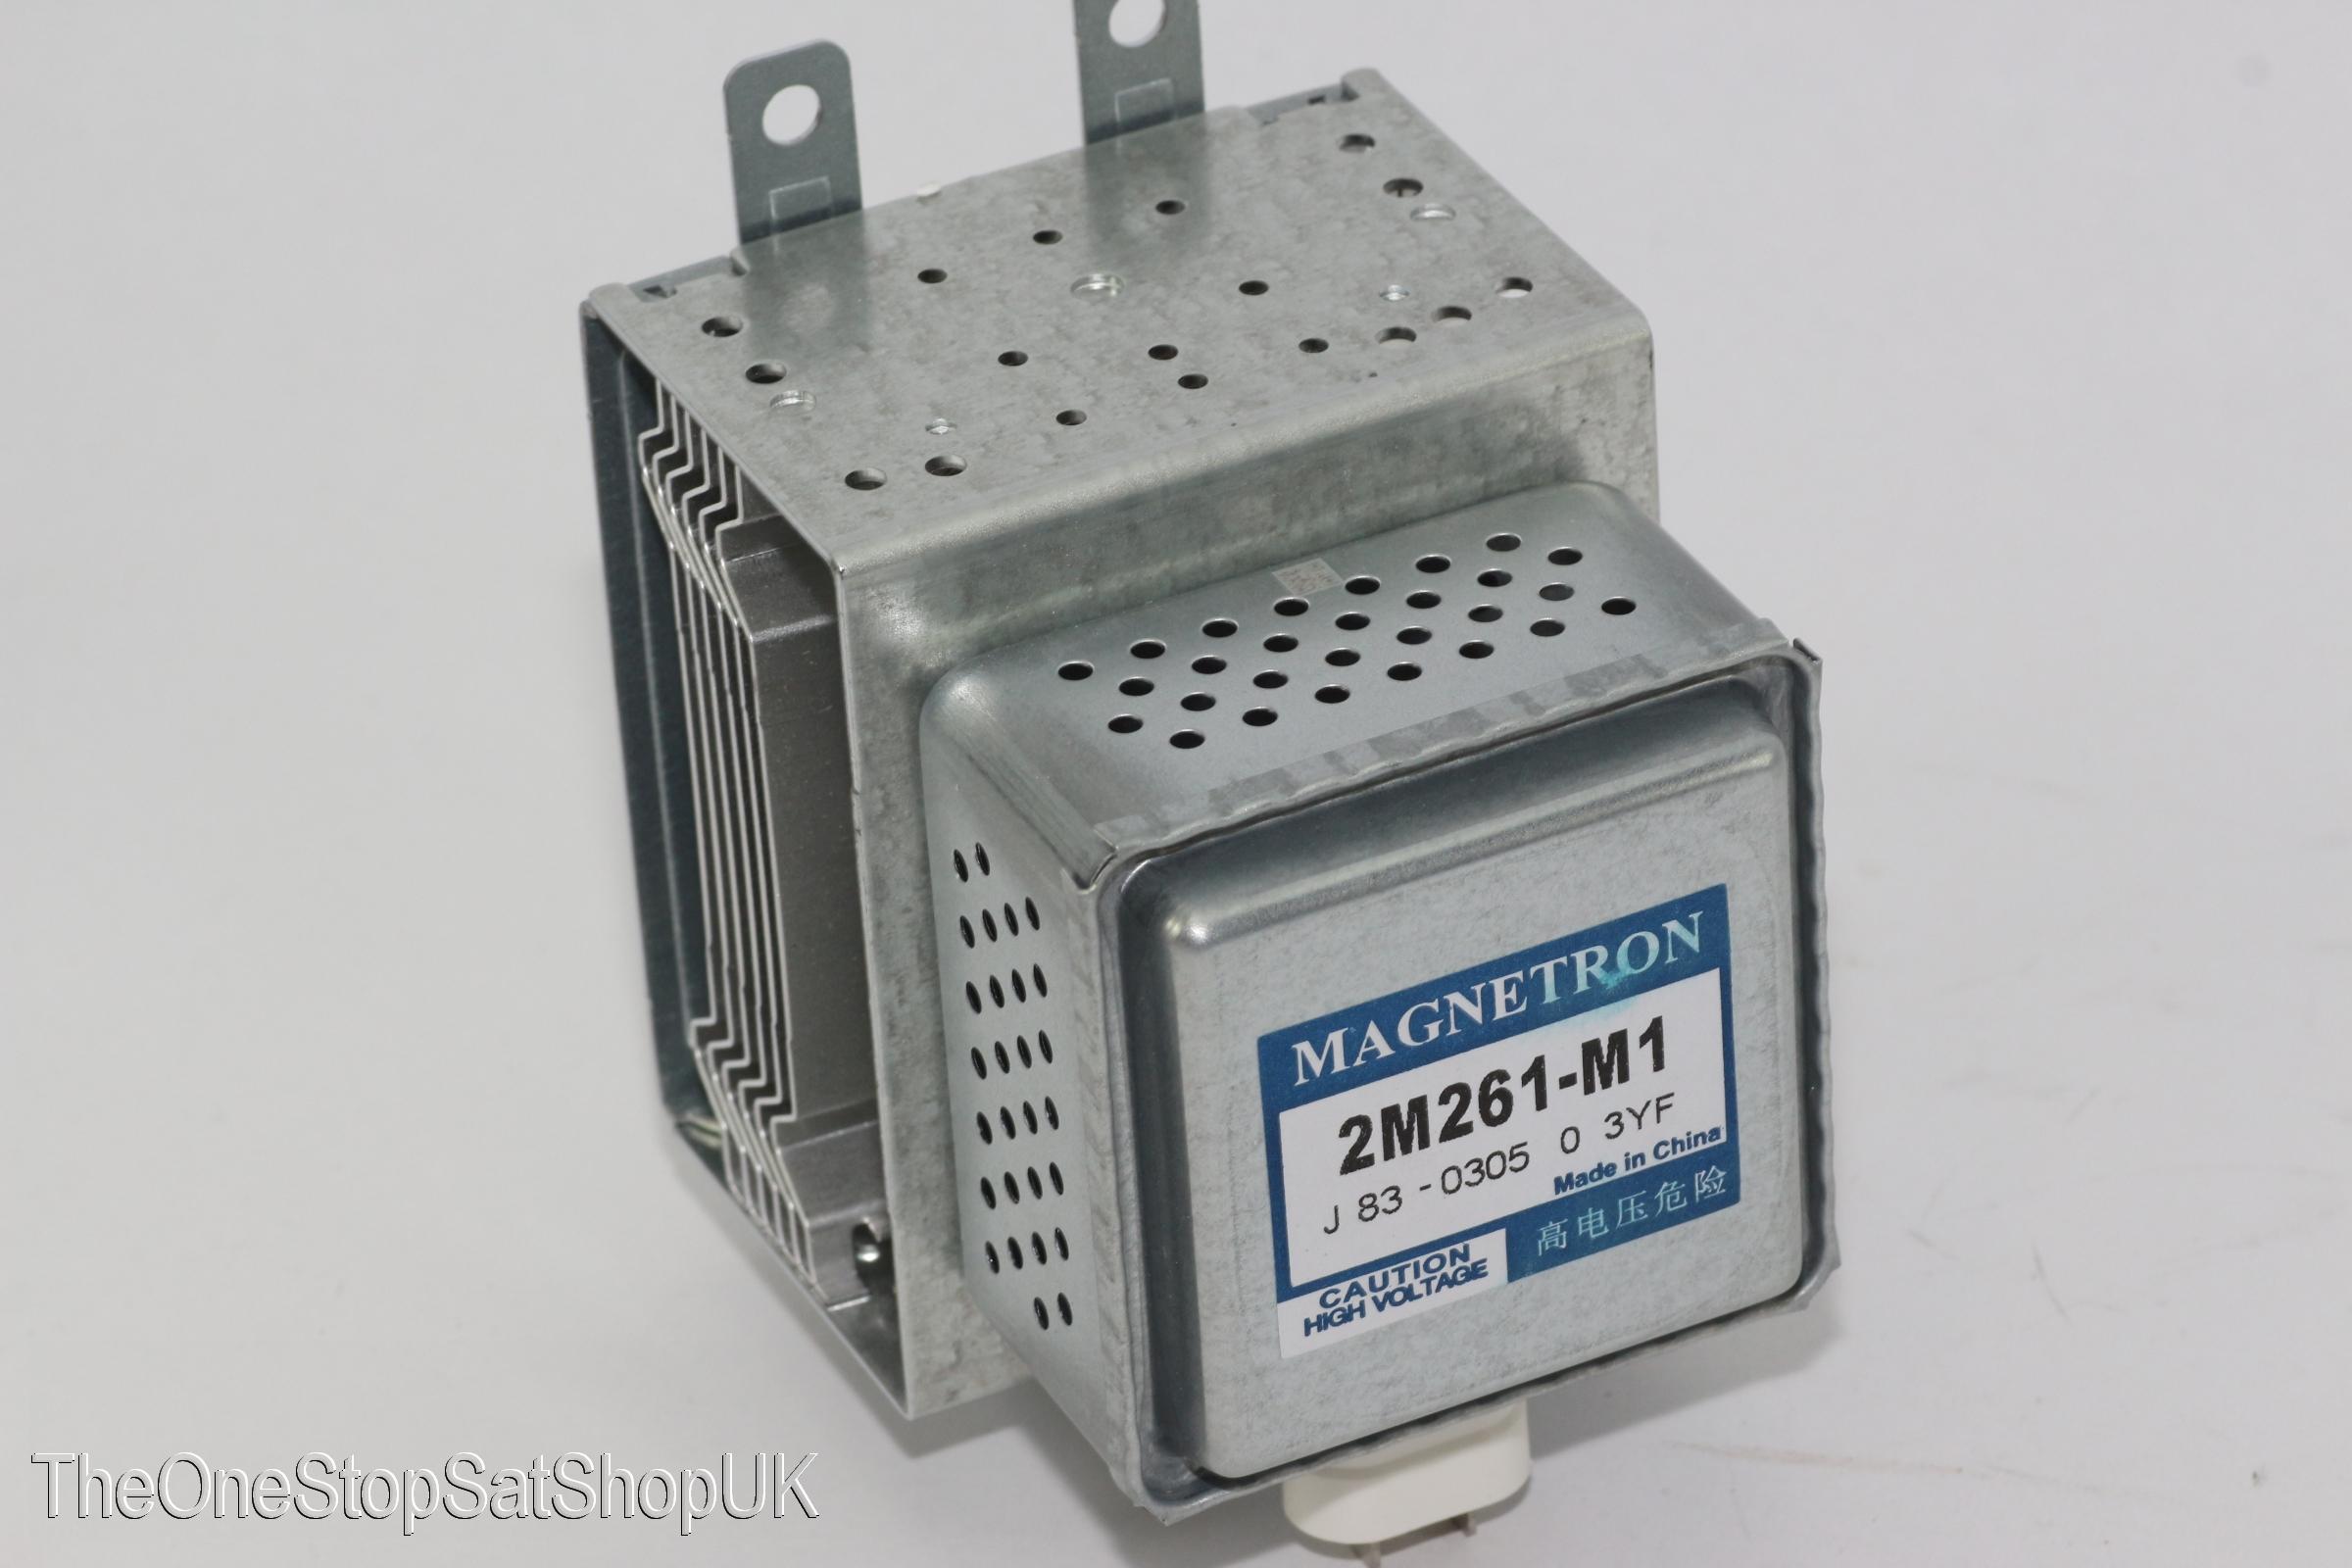 Magnetron PANASONIC Typ 2M210M1 für Mikrowelle | gastrotiger